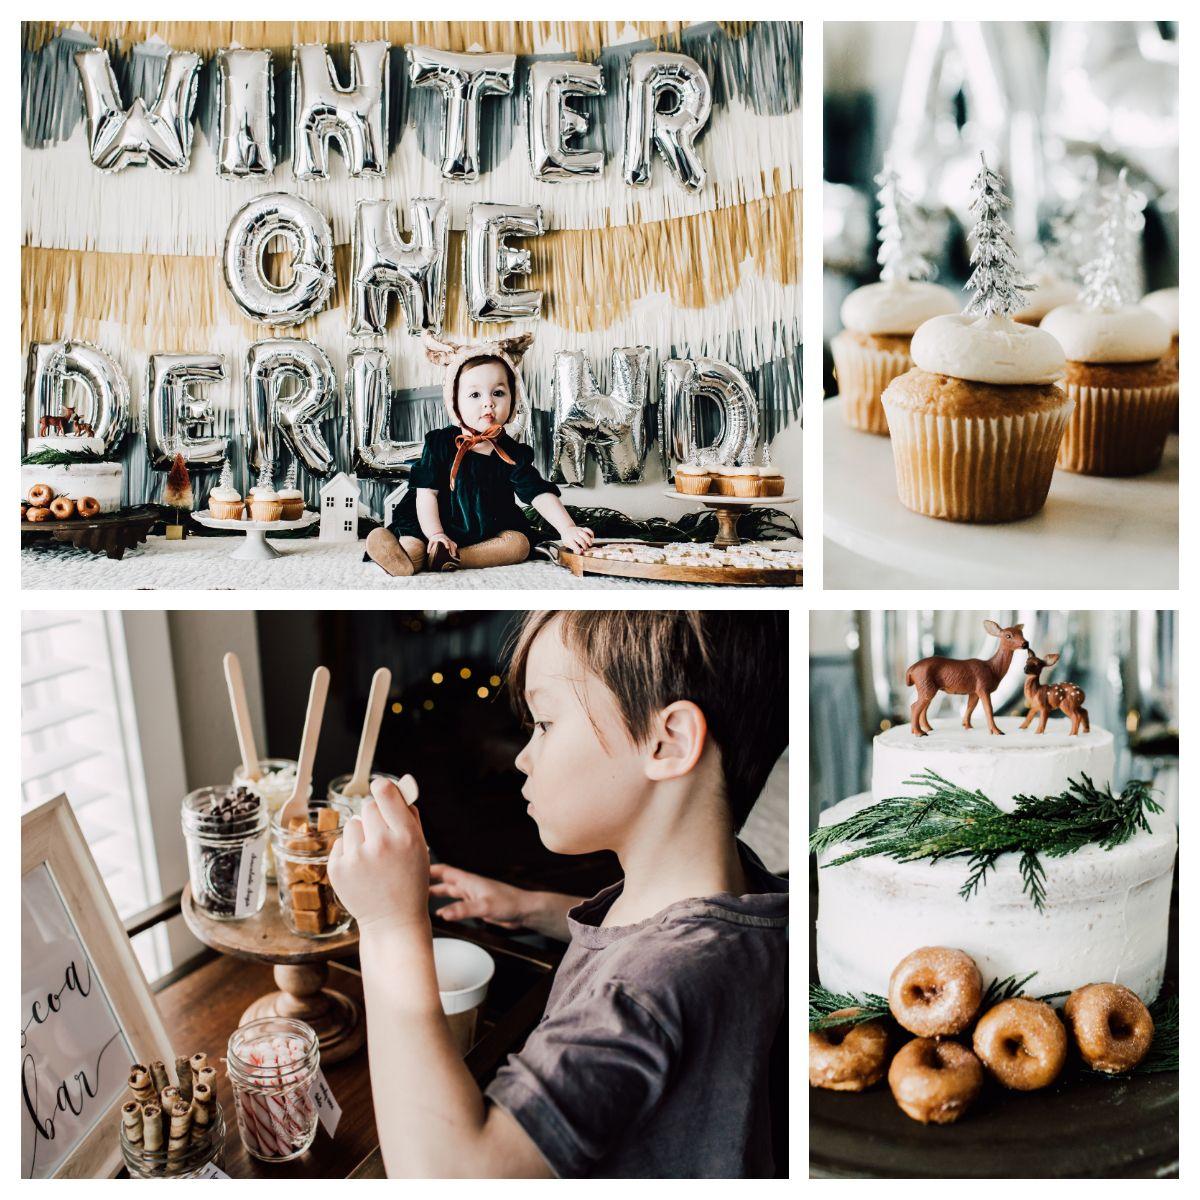 Winter Onederland Birthday Party #babyboy1stbirthdayparty